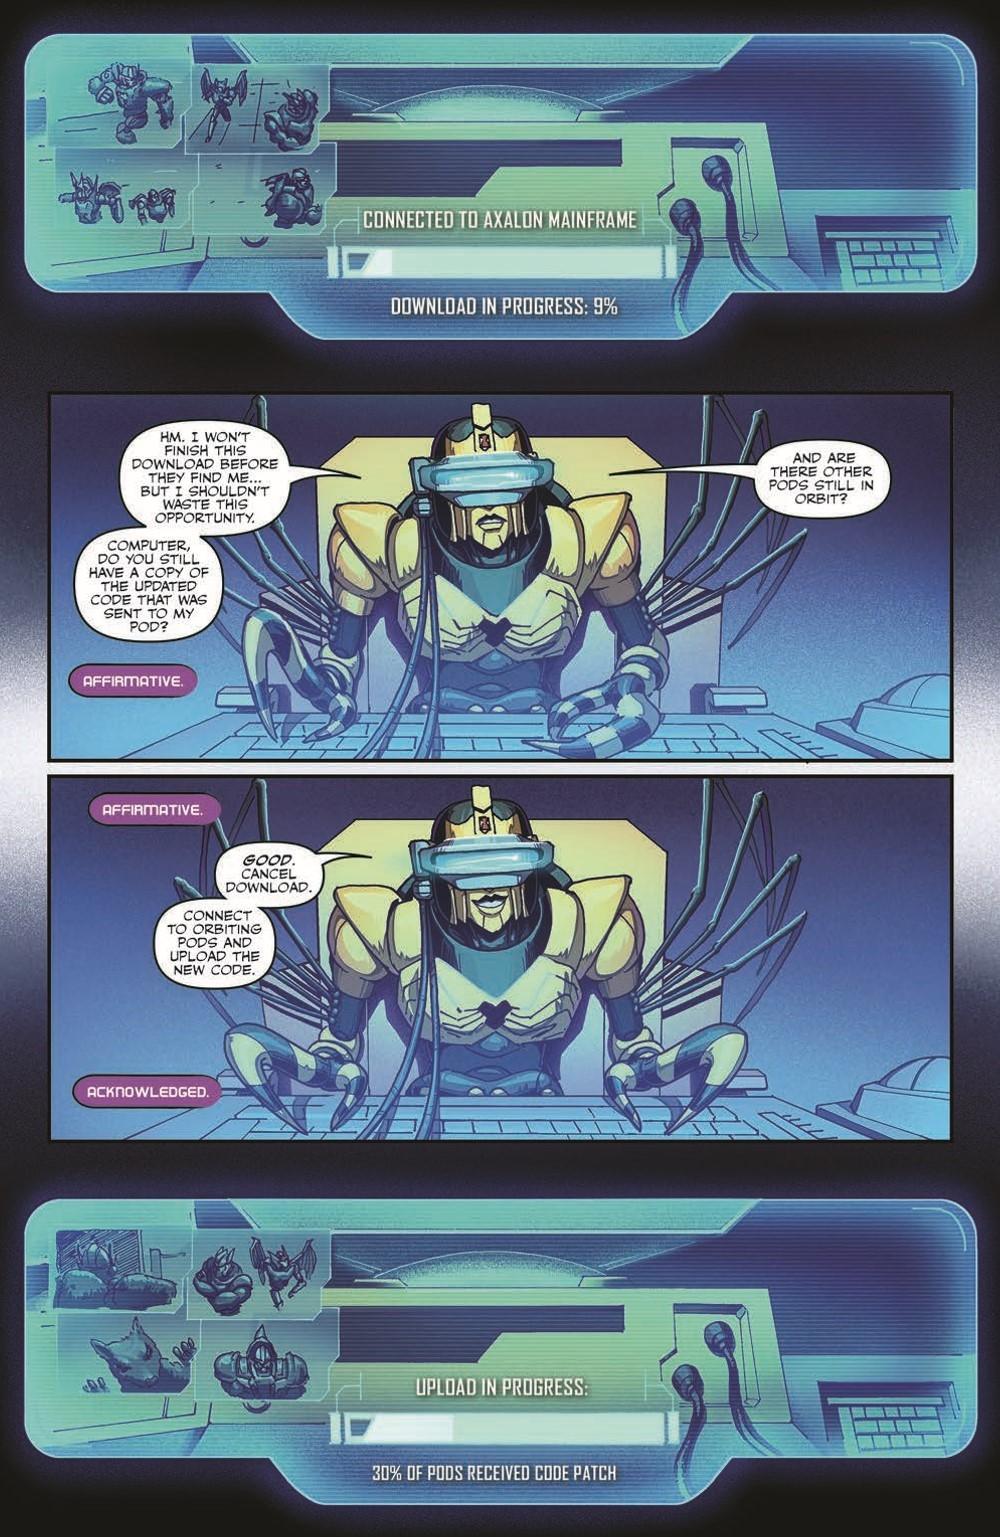 TFBW_08_pr-7 ComicList Previews: TRANSFORMERS BEAST WARS #8